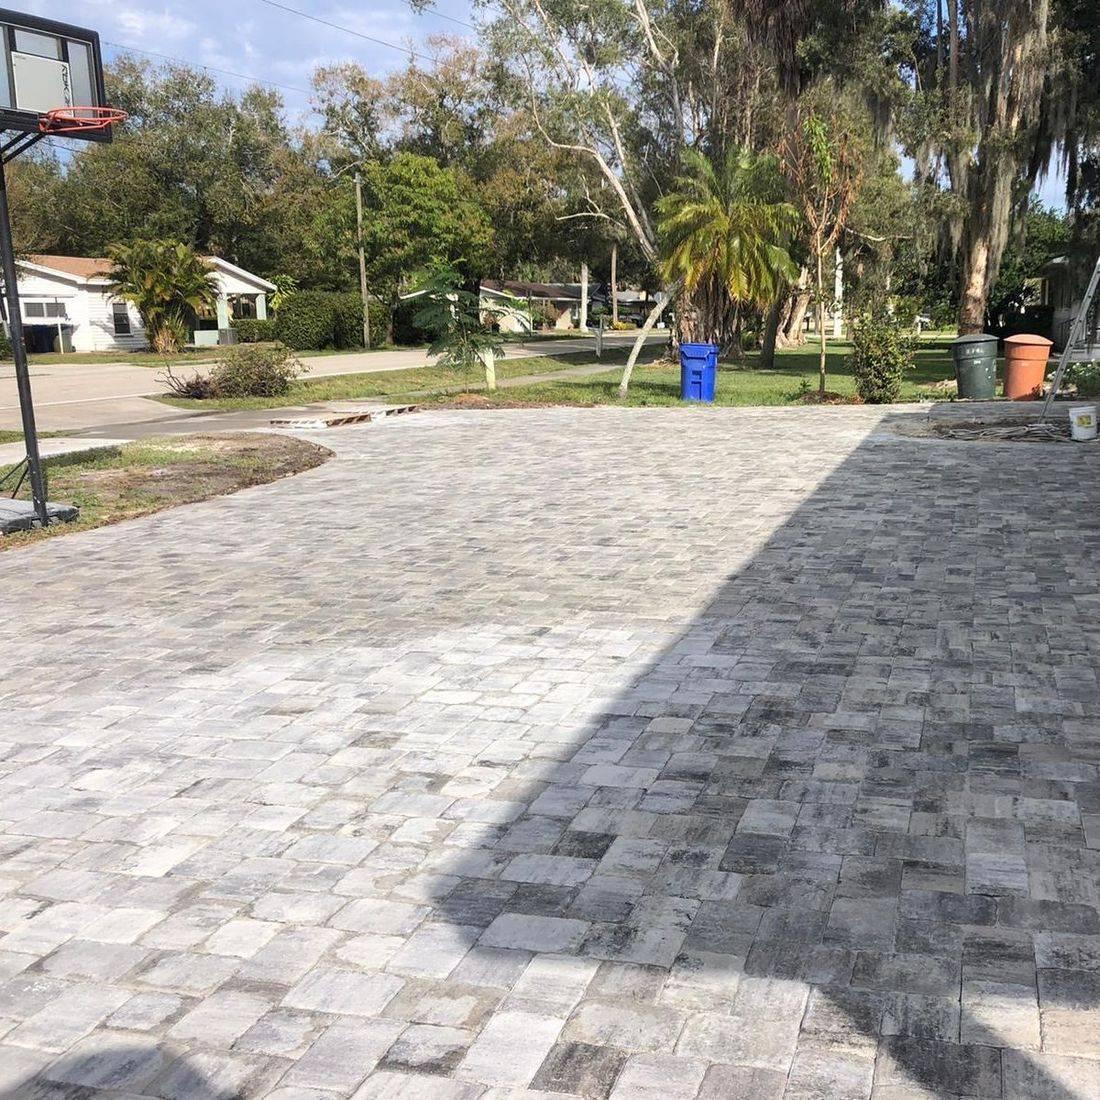 driveway pavers tricricle pavers white charcoal megastone